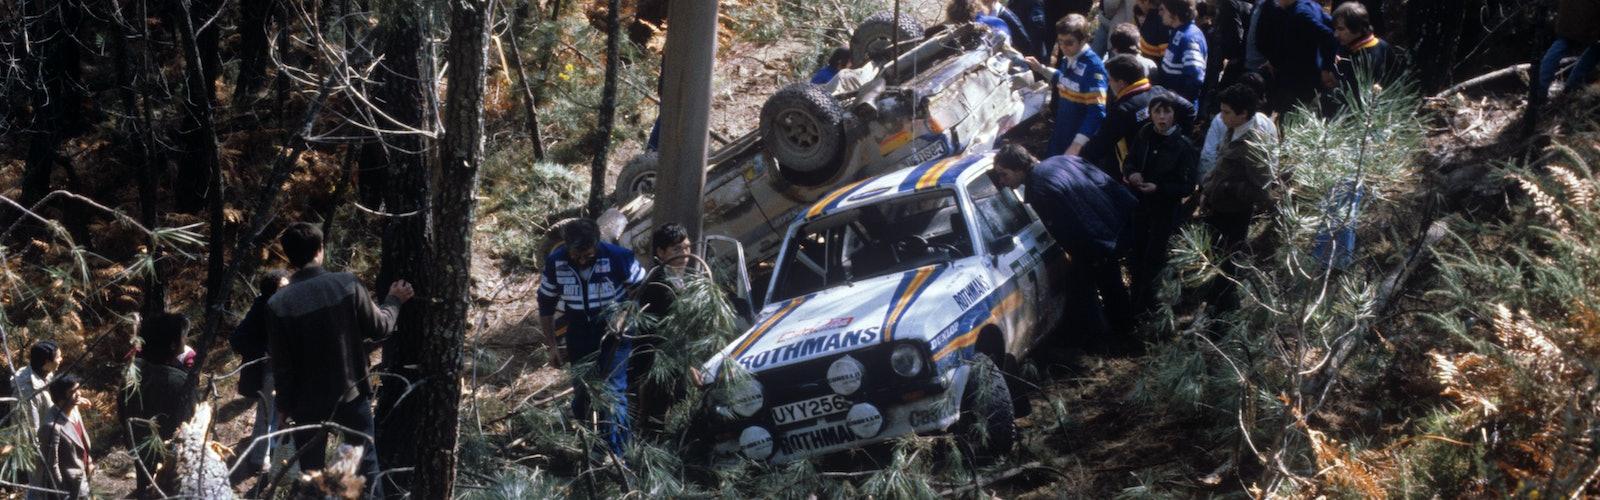 1980 Portugal Rallyecopyright: McKlein